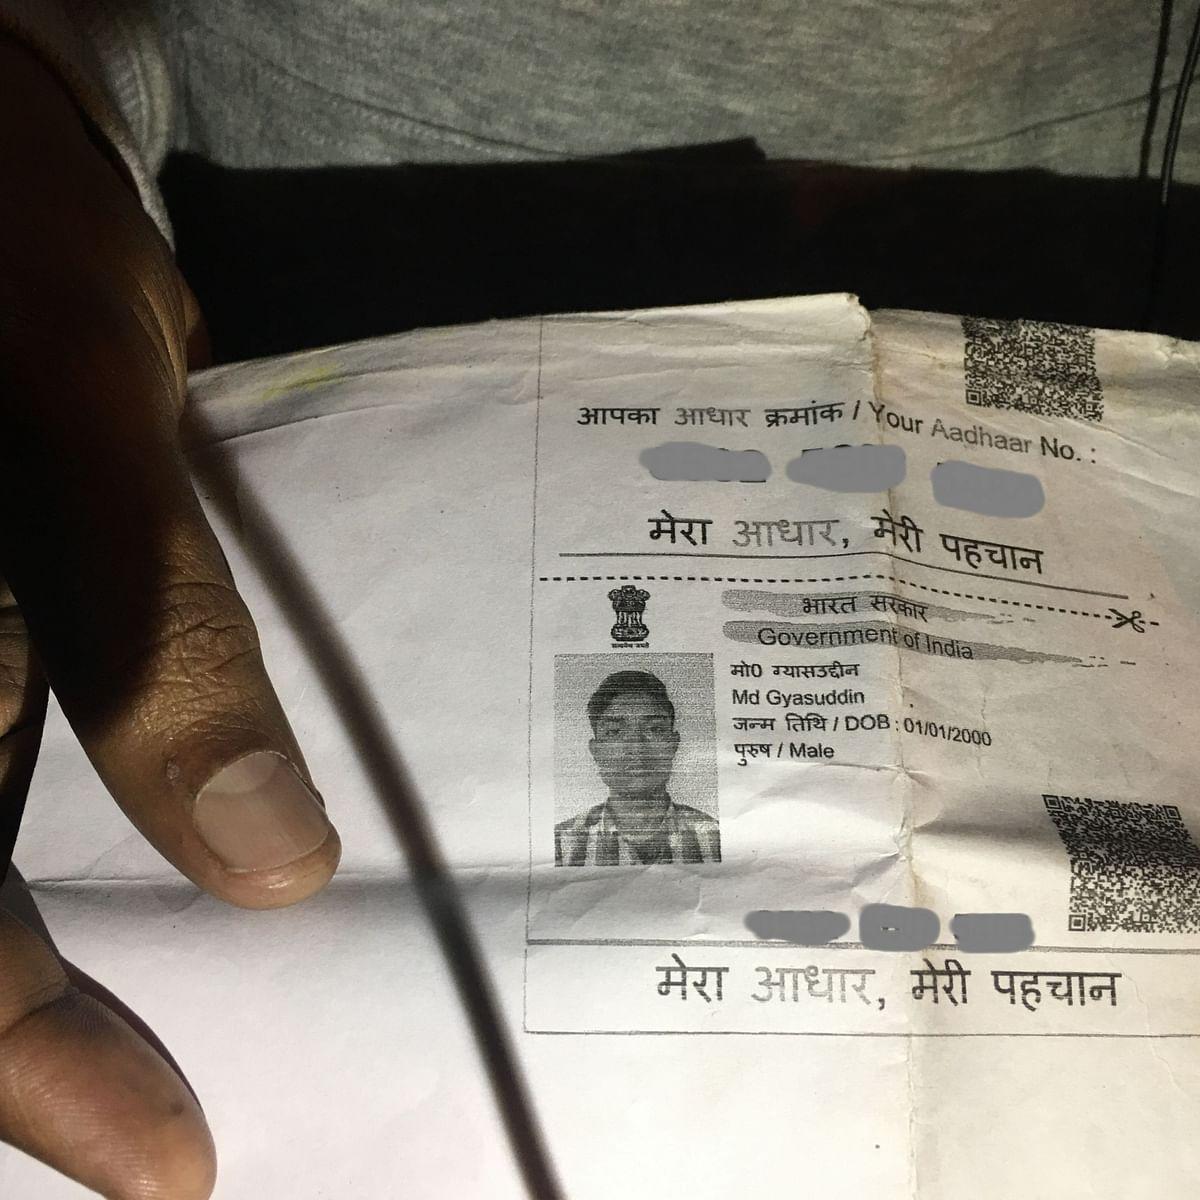 Mohd Kasim, a local from Delhi's Nawada locality, showing the Aadhaar card of Ghiyasuddin outside LNJP Hospital.